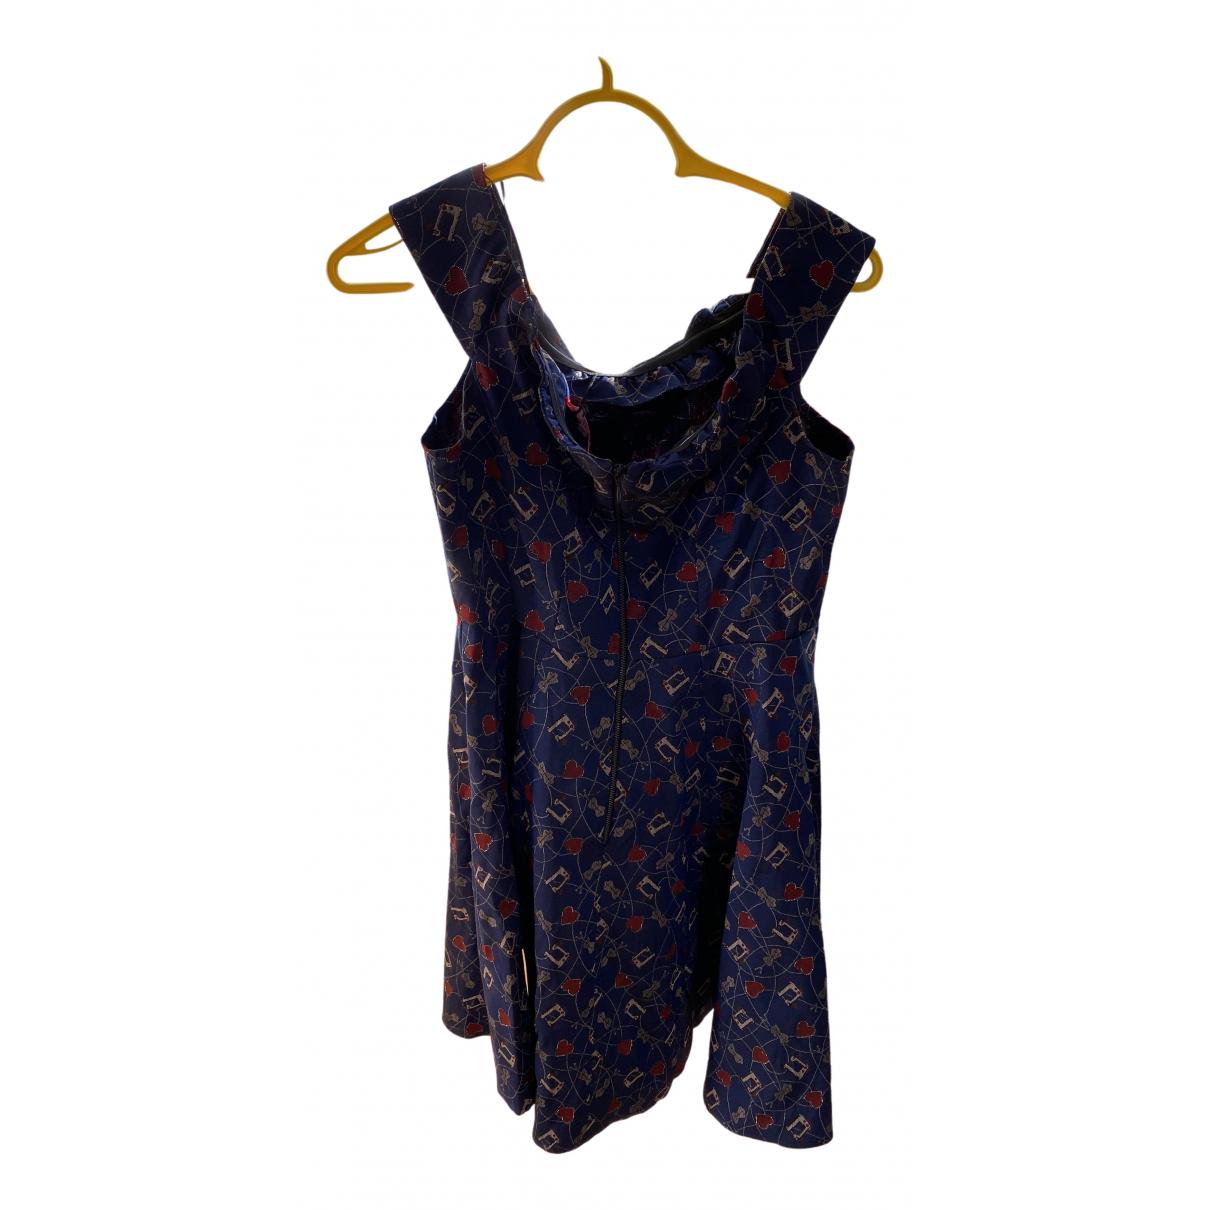 Maison Hēroine \N Kleid in  Blau Baumwolle - Elasthan